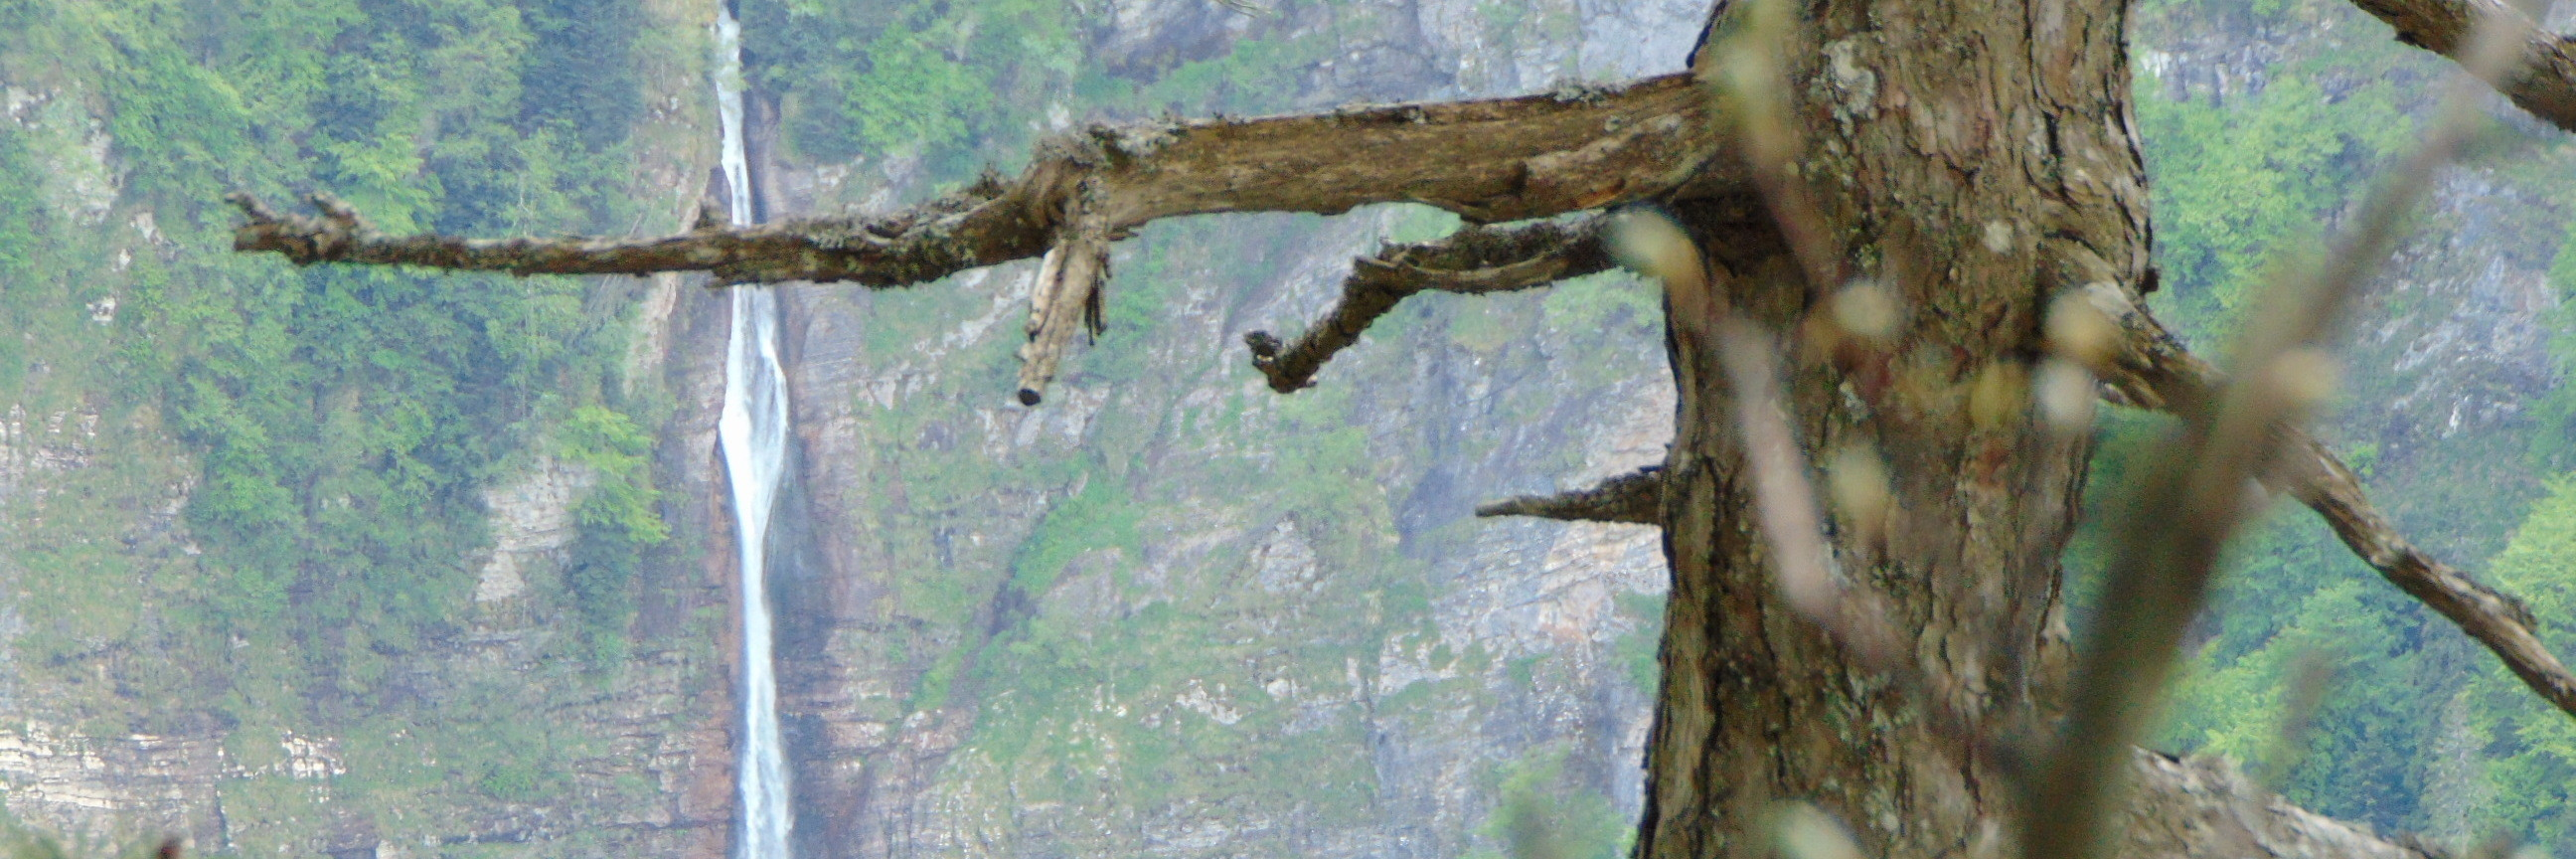 Водопад Скакавац в Перучице